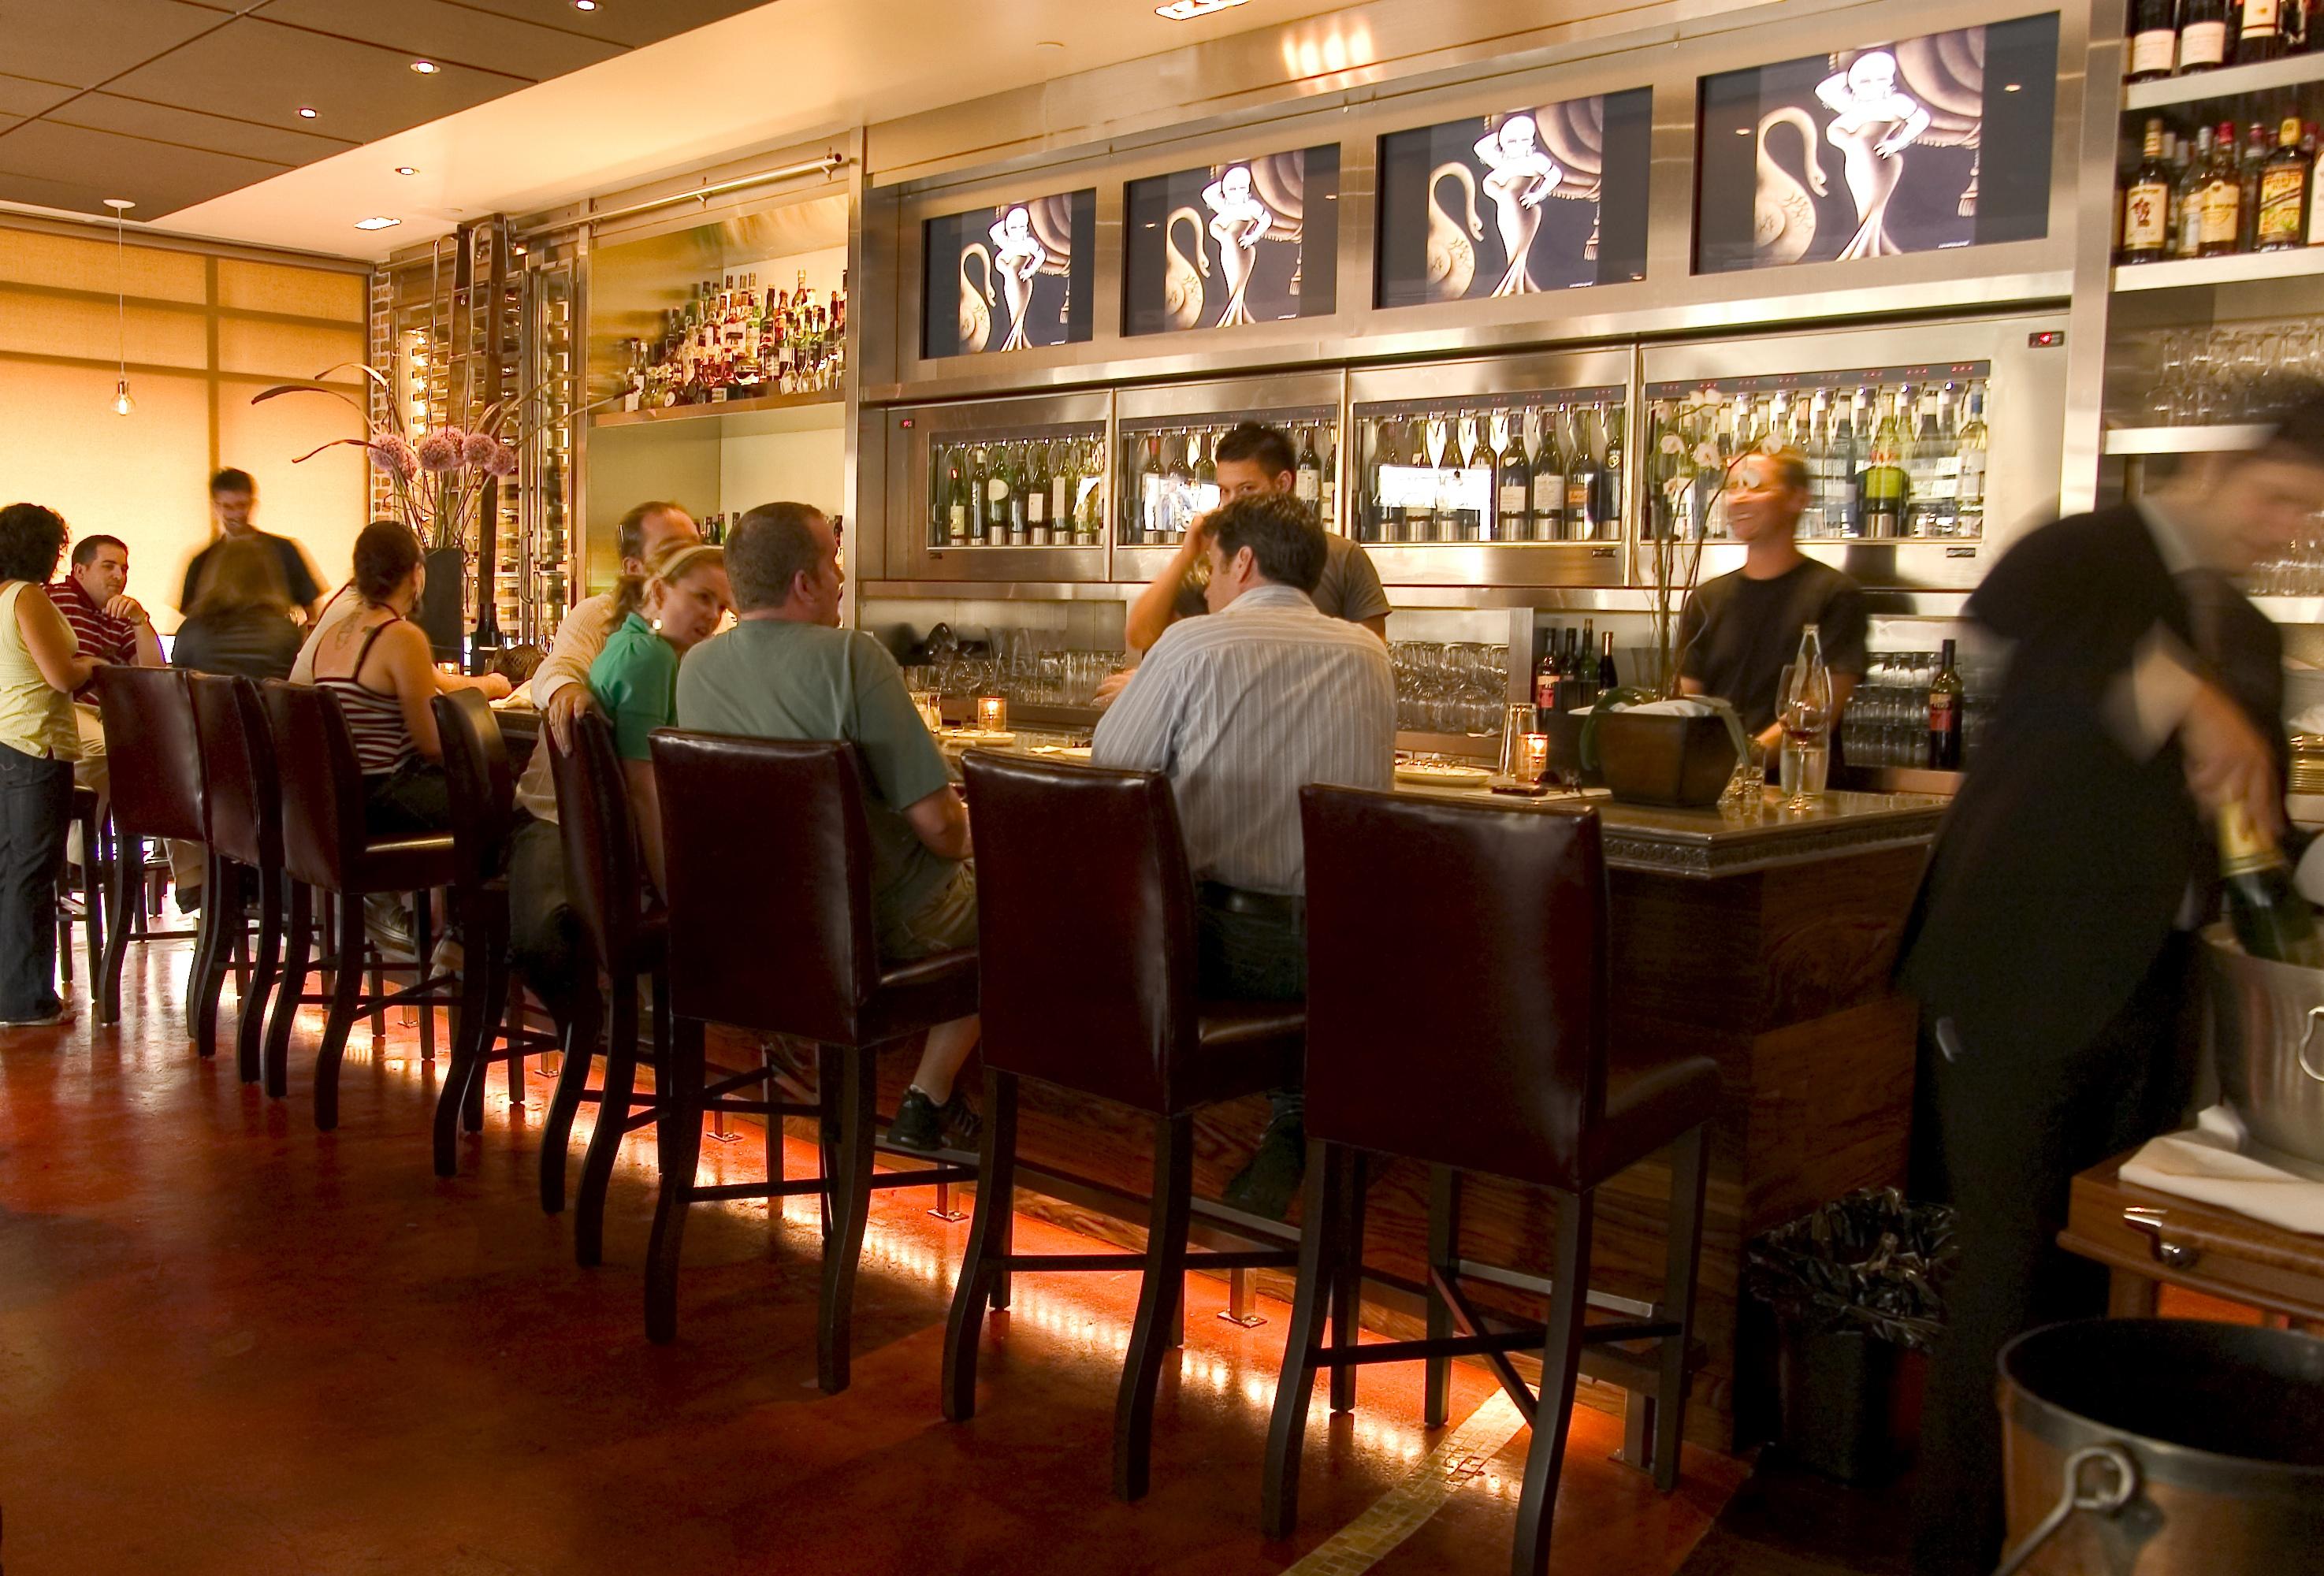 The bar inside Proof on G street in Washington, D.C.